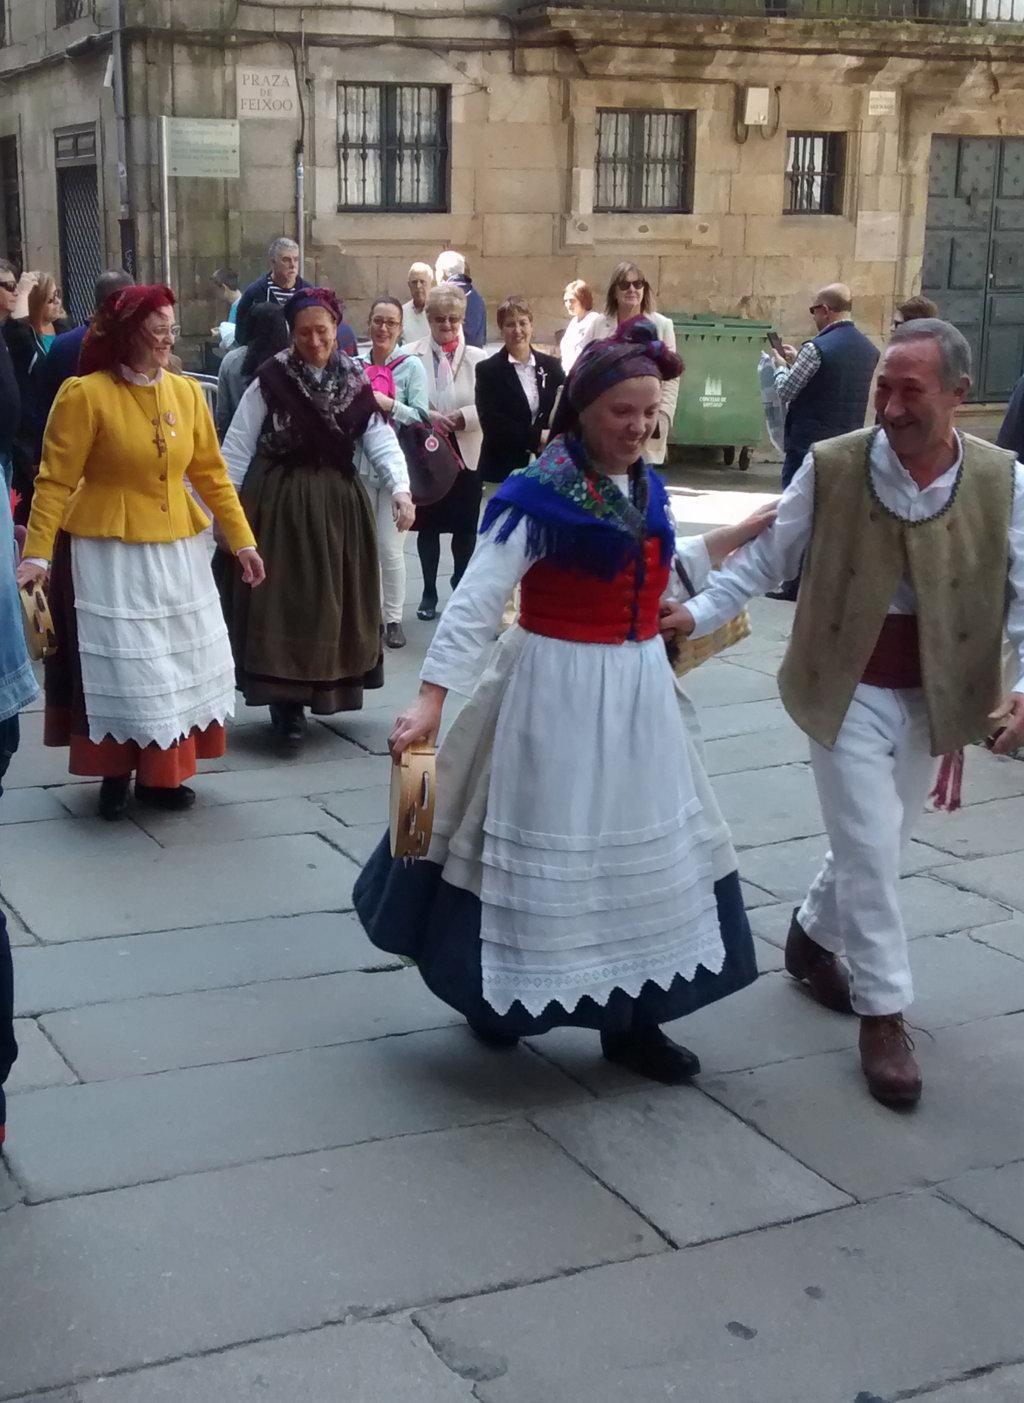 Galegos paseando